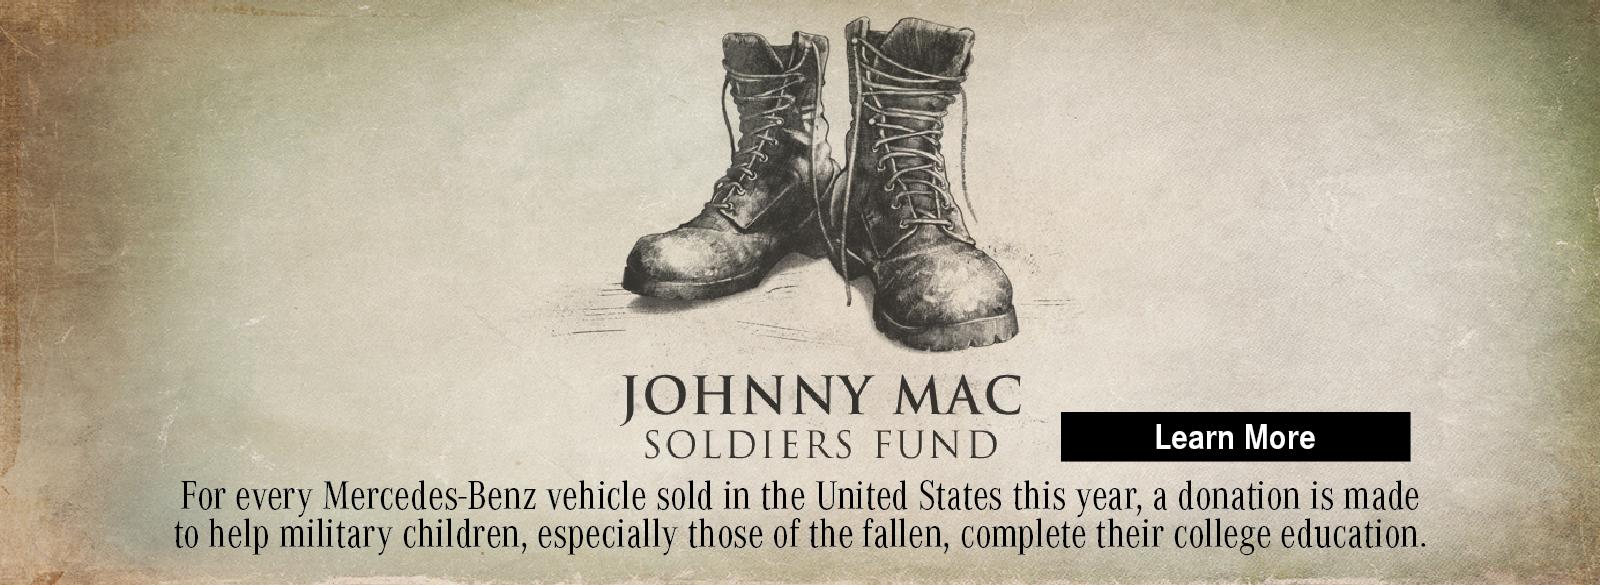 Johnny Mac MBM1